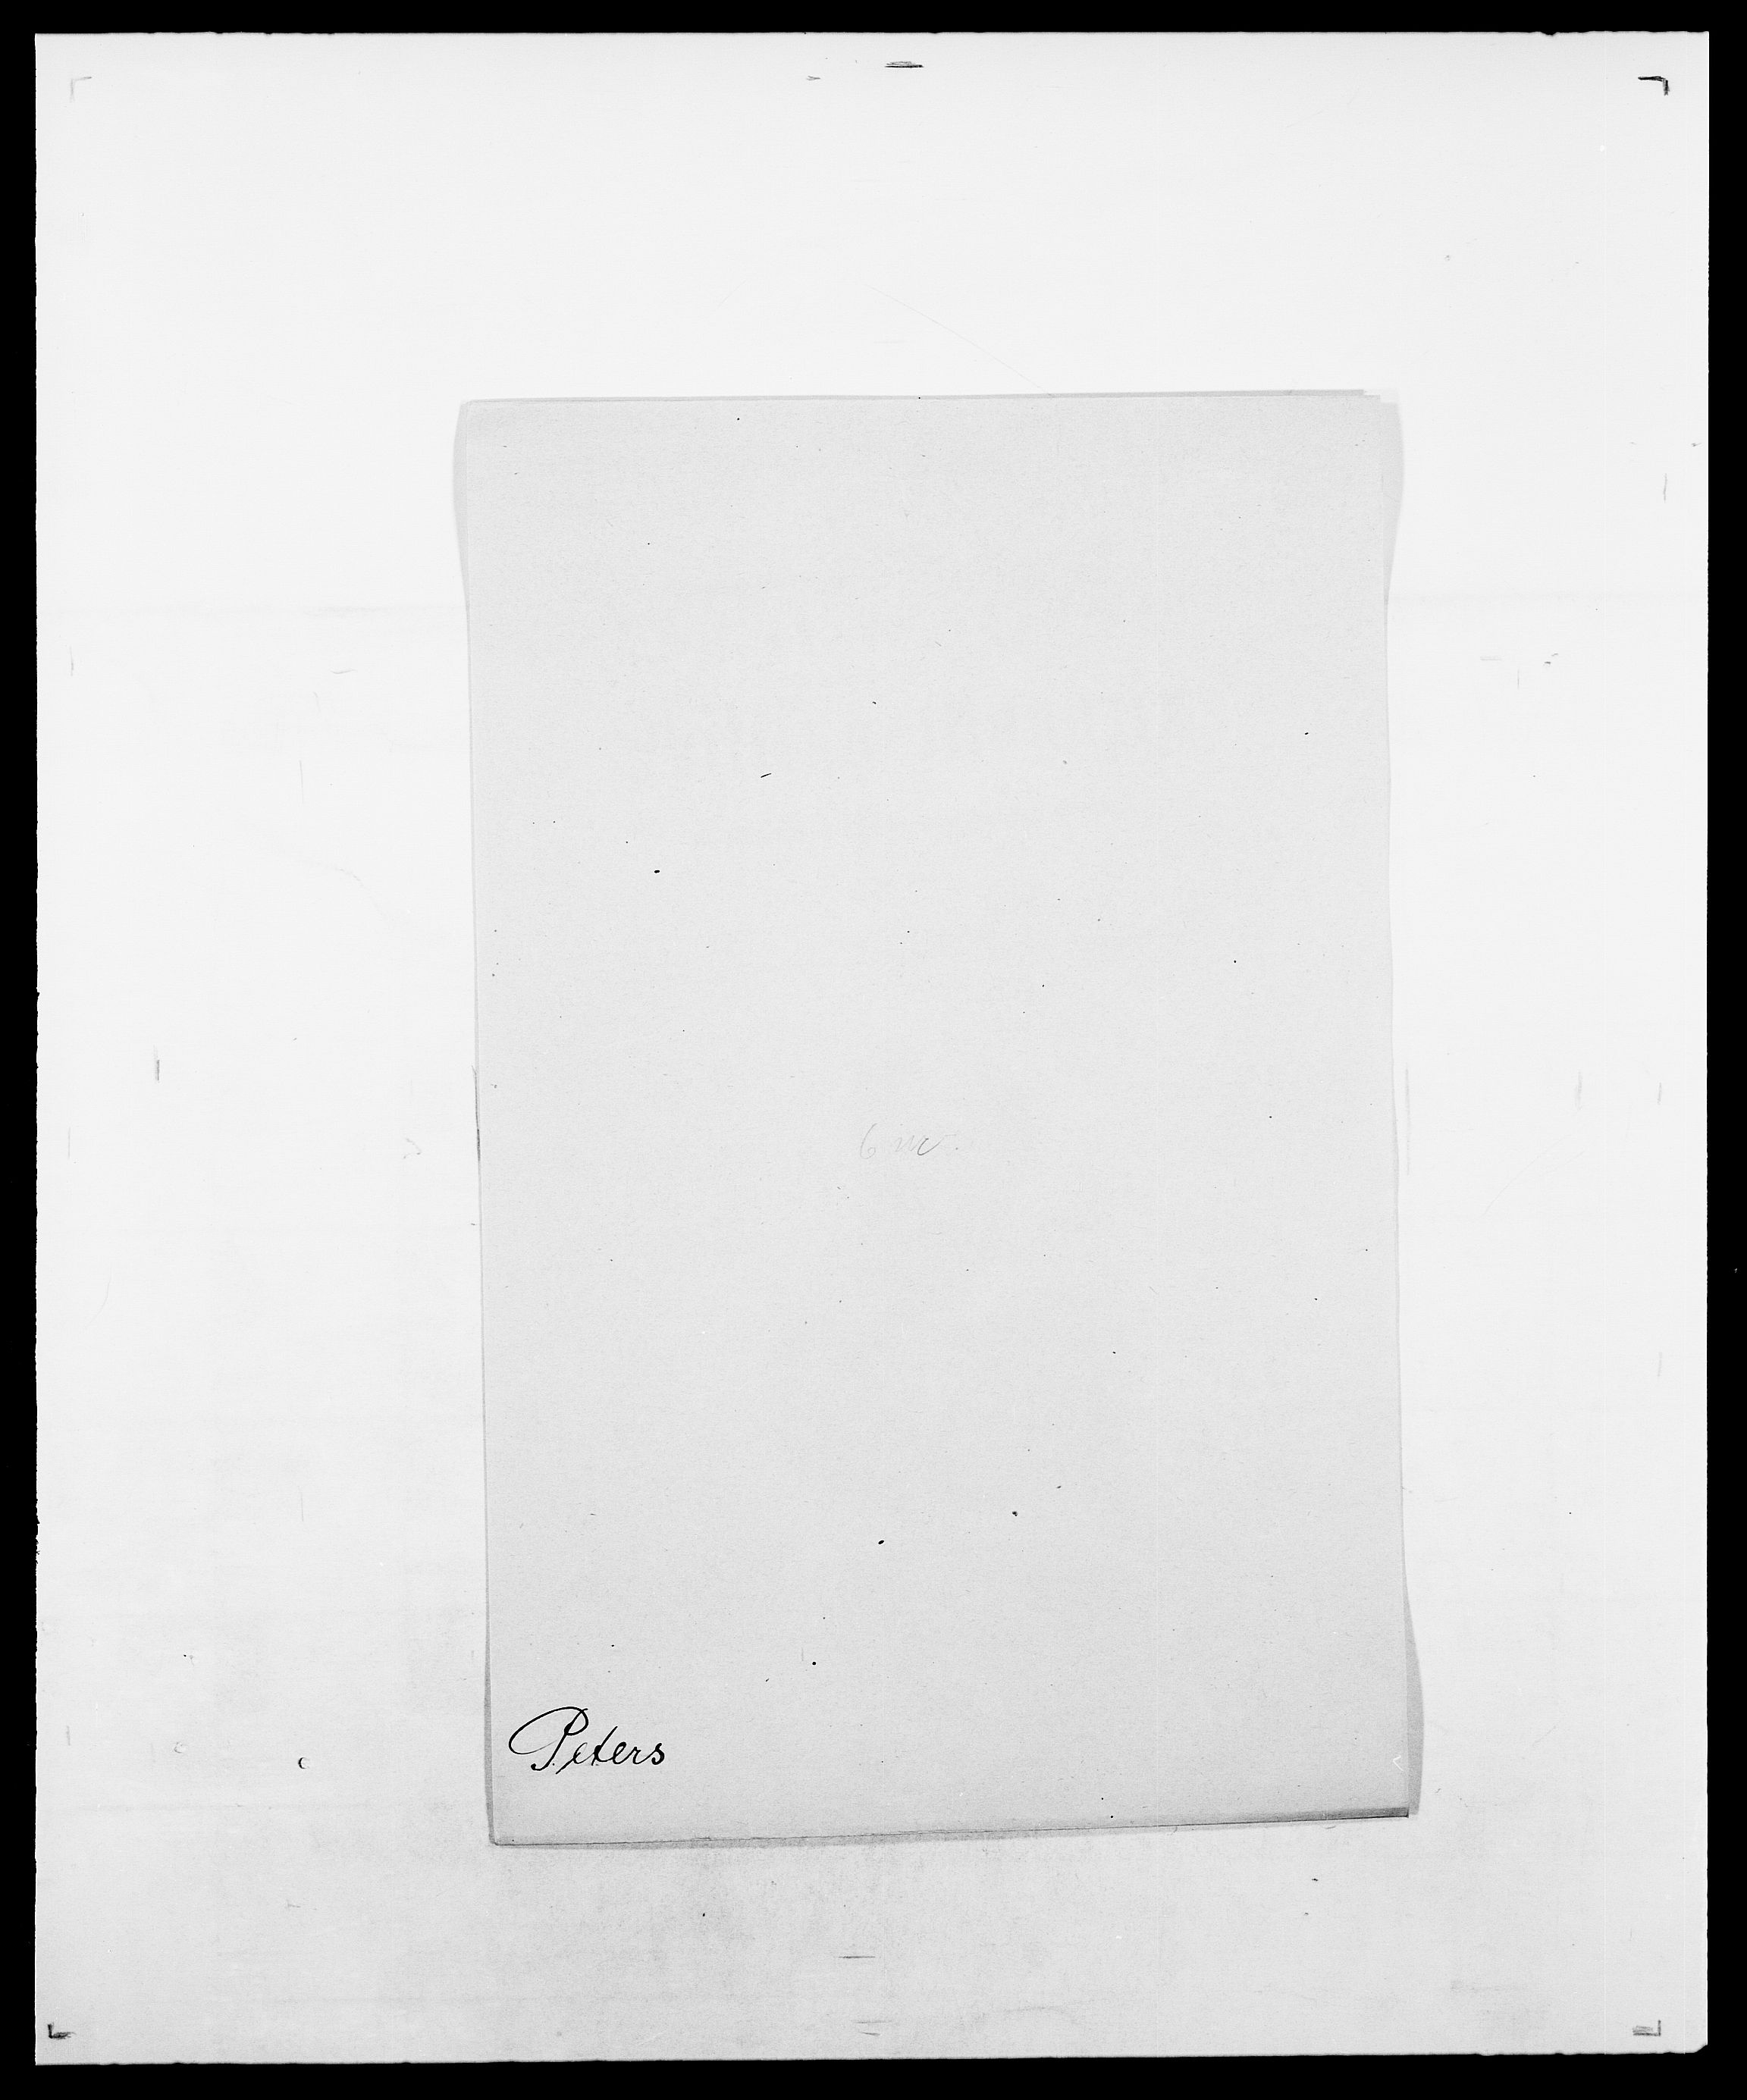 SAO, Delgobe, Charles Antoine - samling, D/Da/L0030: Paars - Pittelkov, s. 375